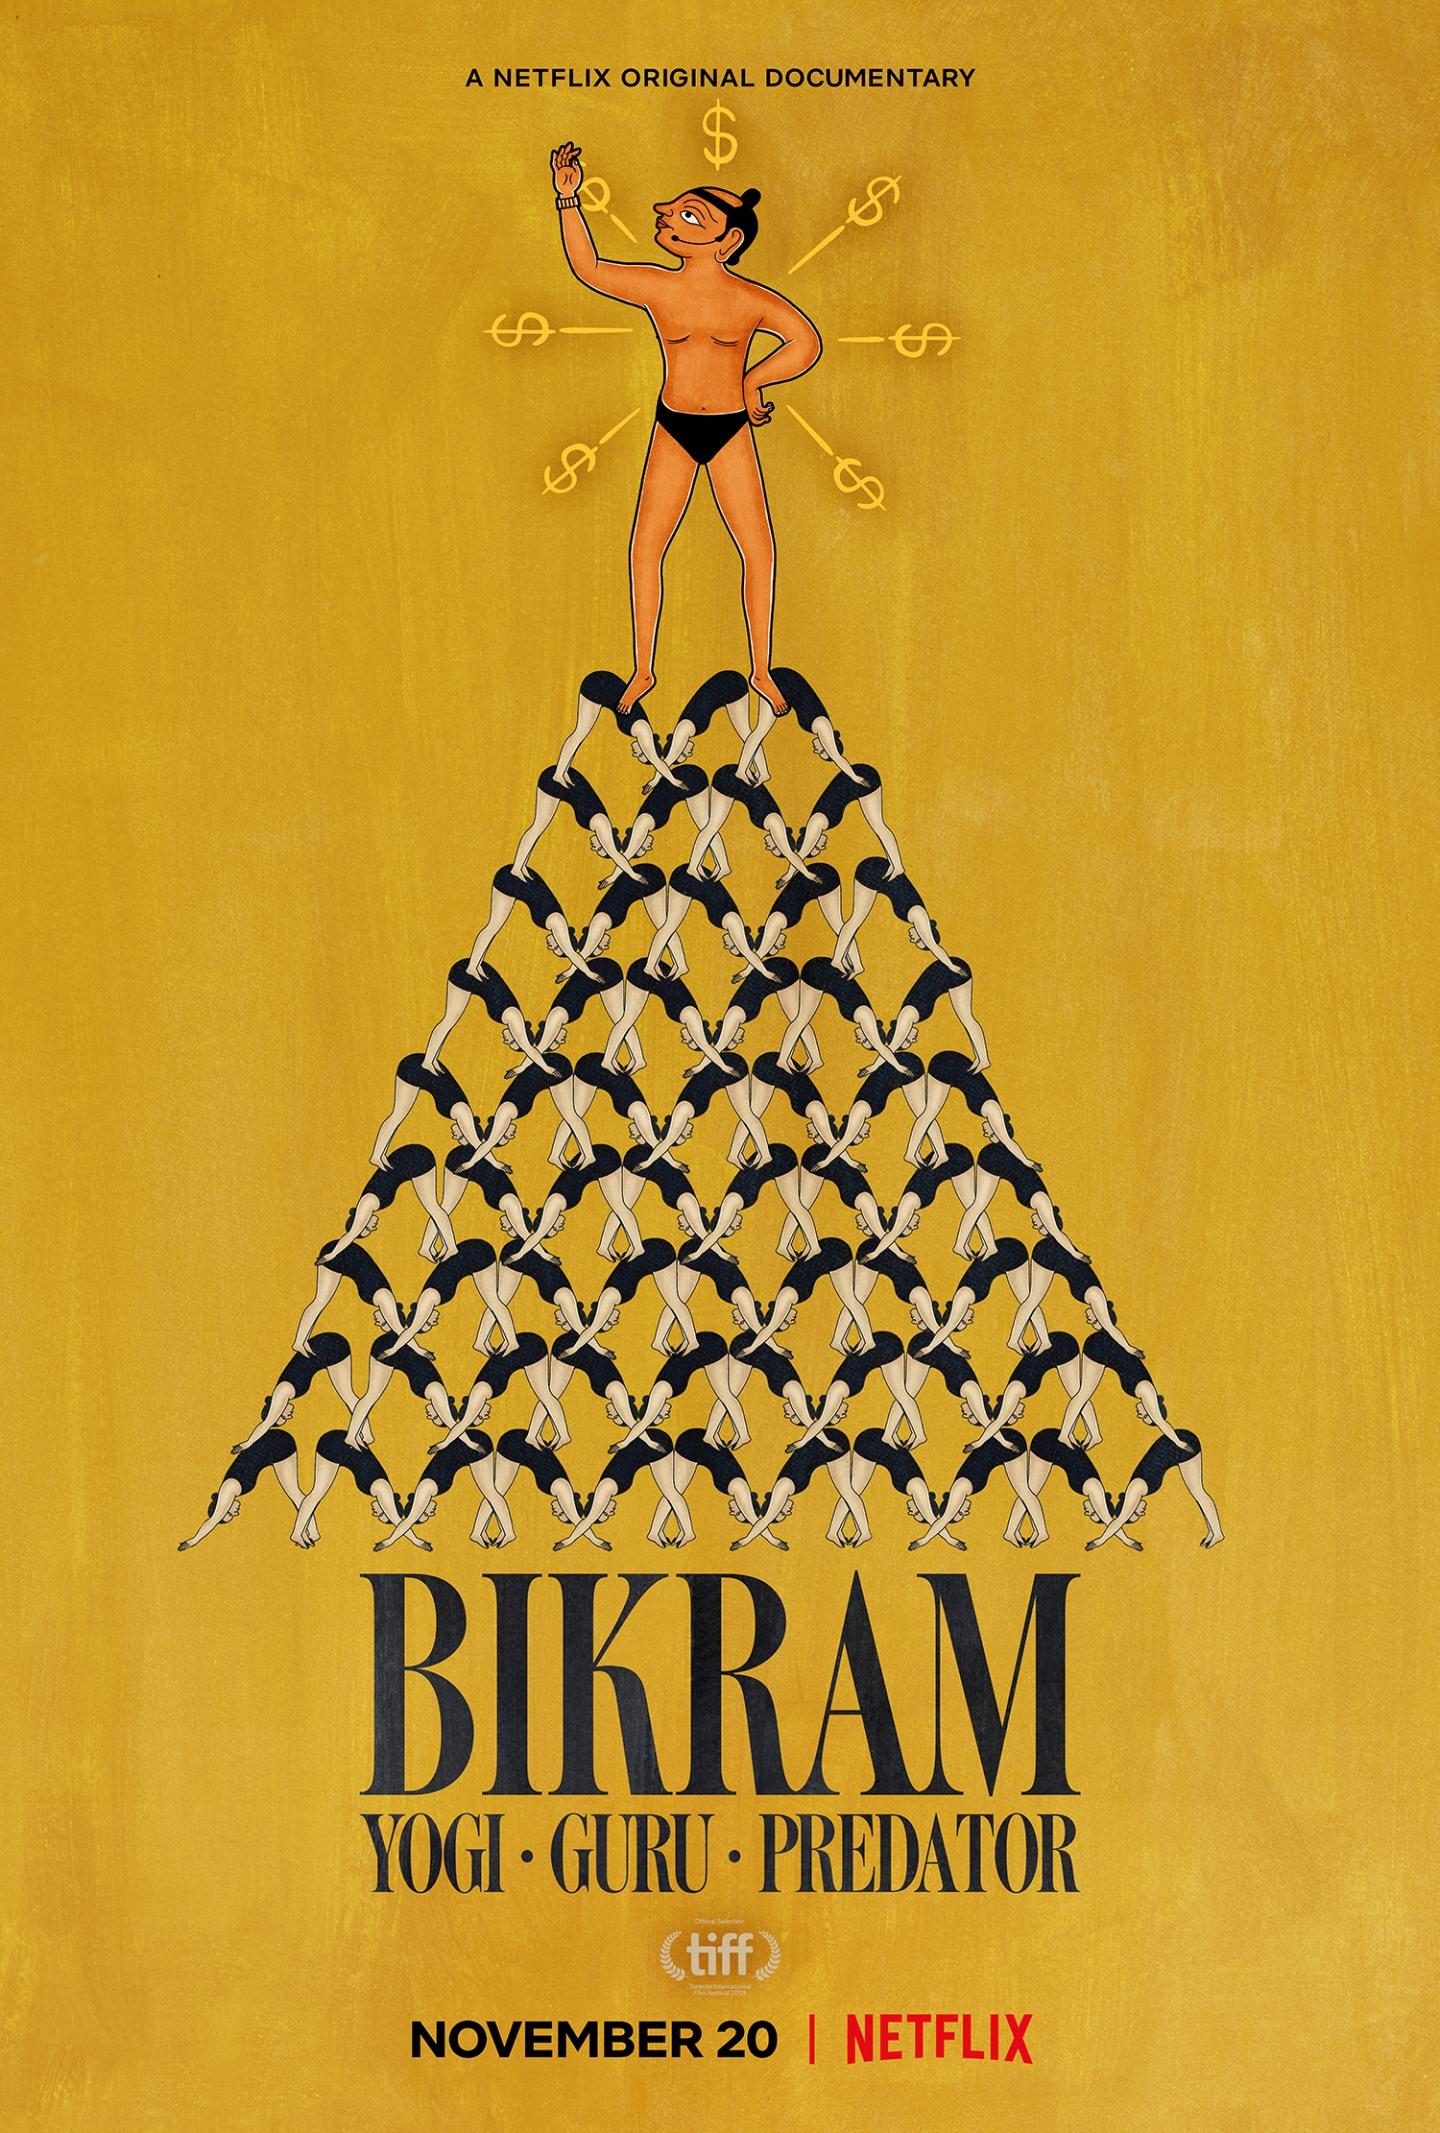 Bikram: Yogi, Guru, Predator Film Poster